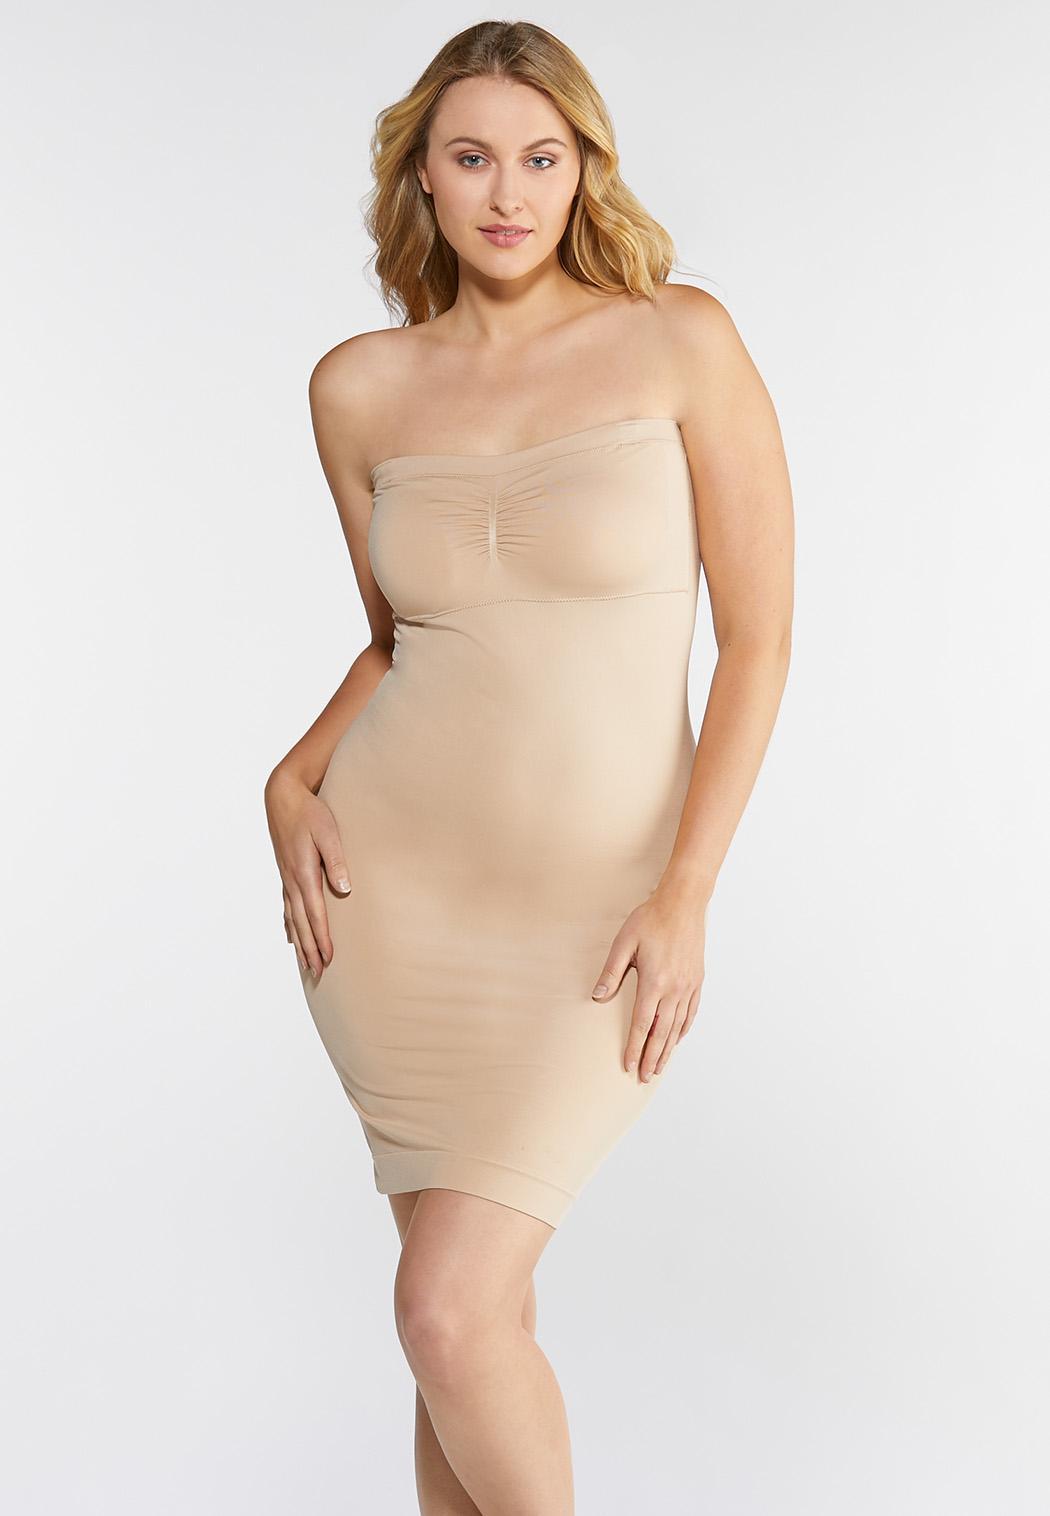 Plus Size Nude Seamless Midi Slip (Item #35618537)